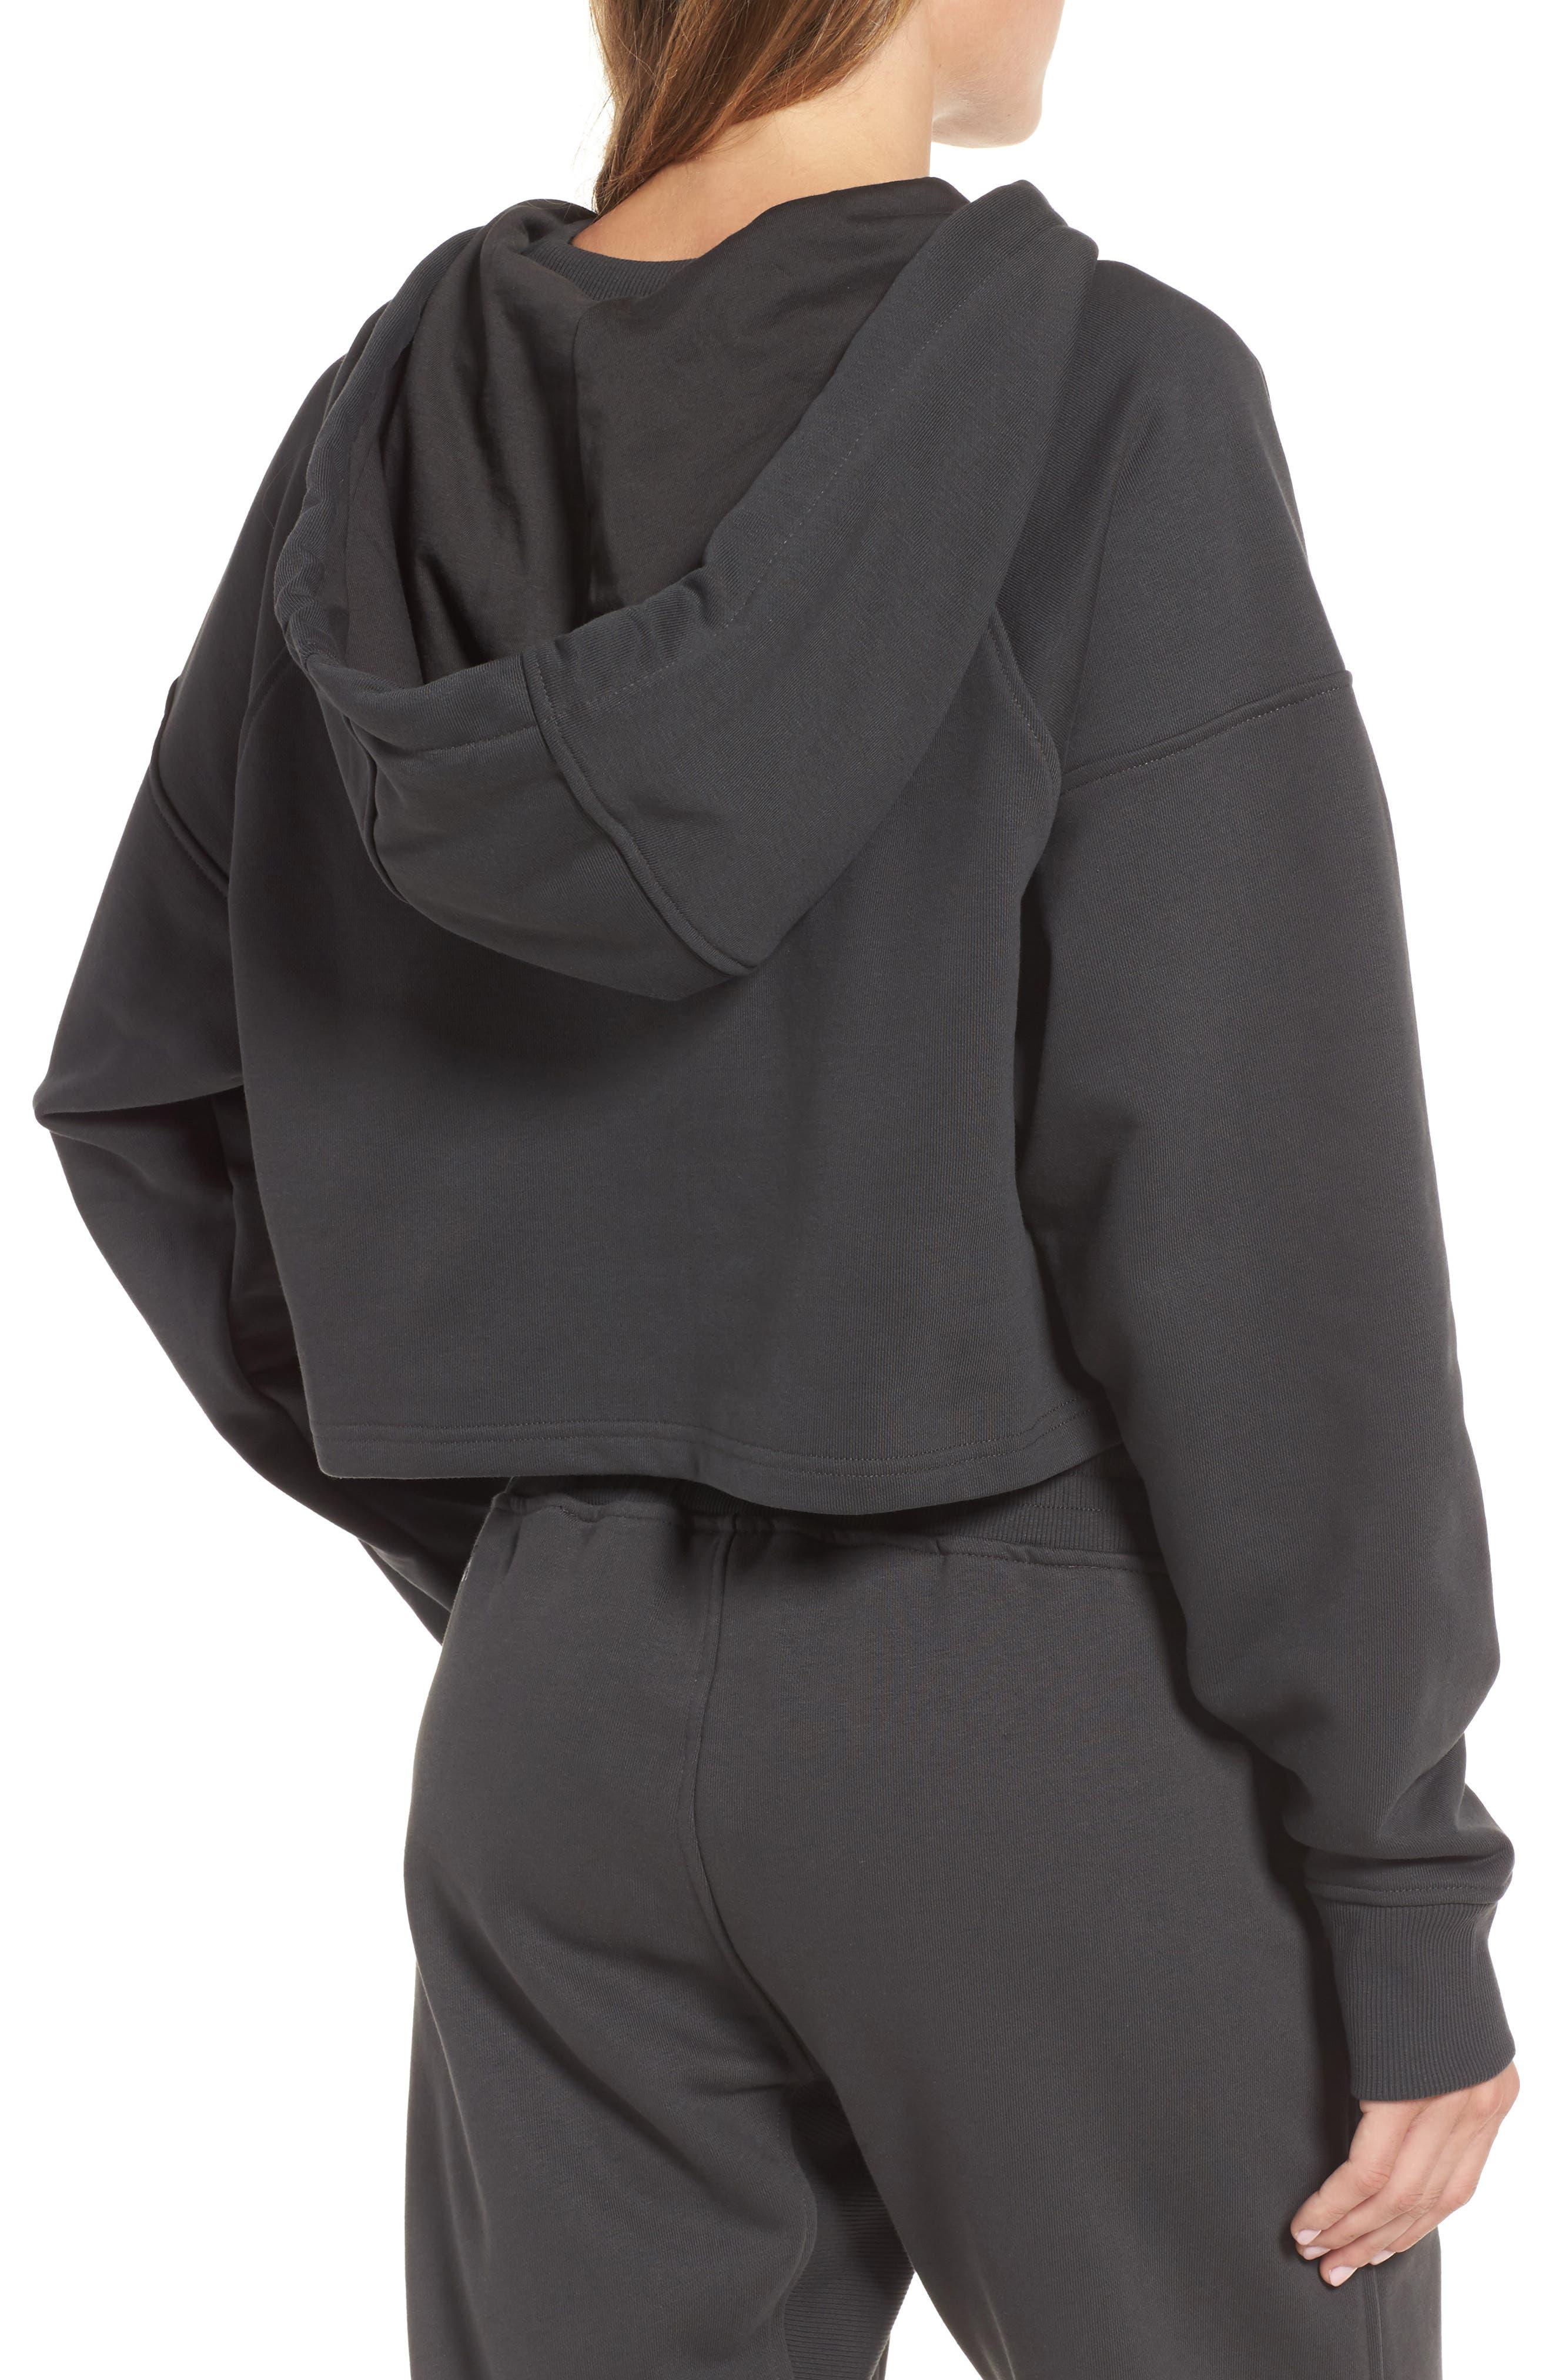 Alternate Image 2  - IVY PARK® Washed Jersey Logo Crop Hoodie